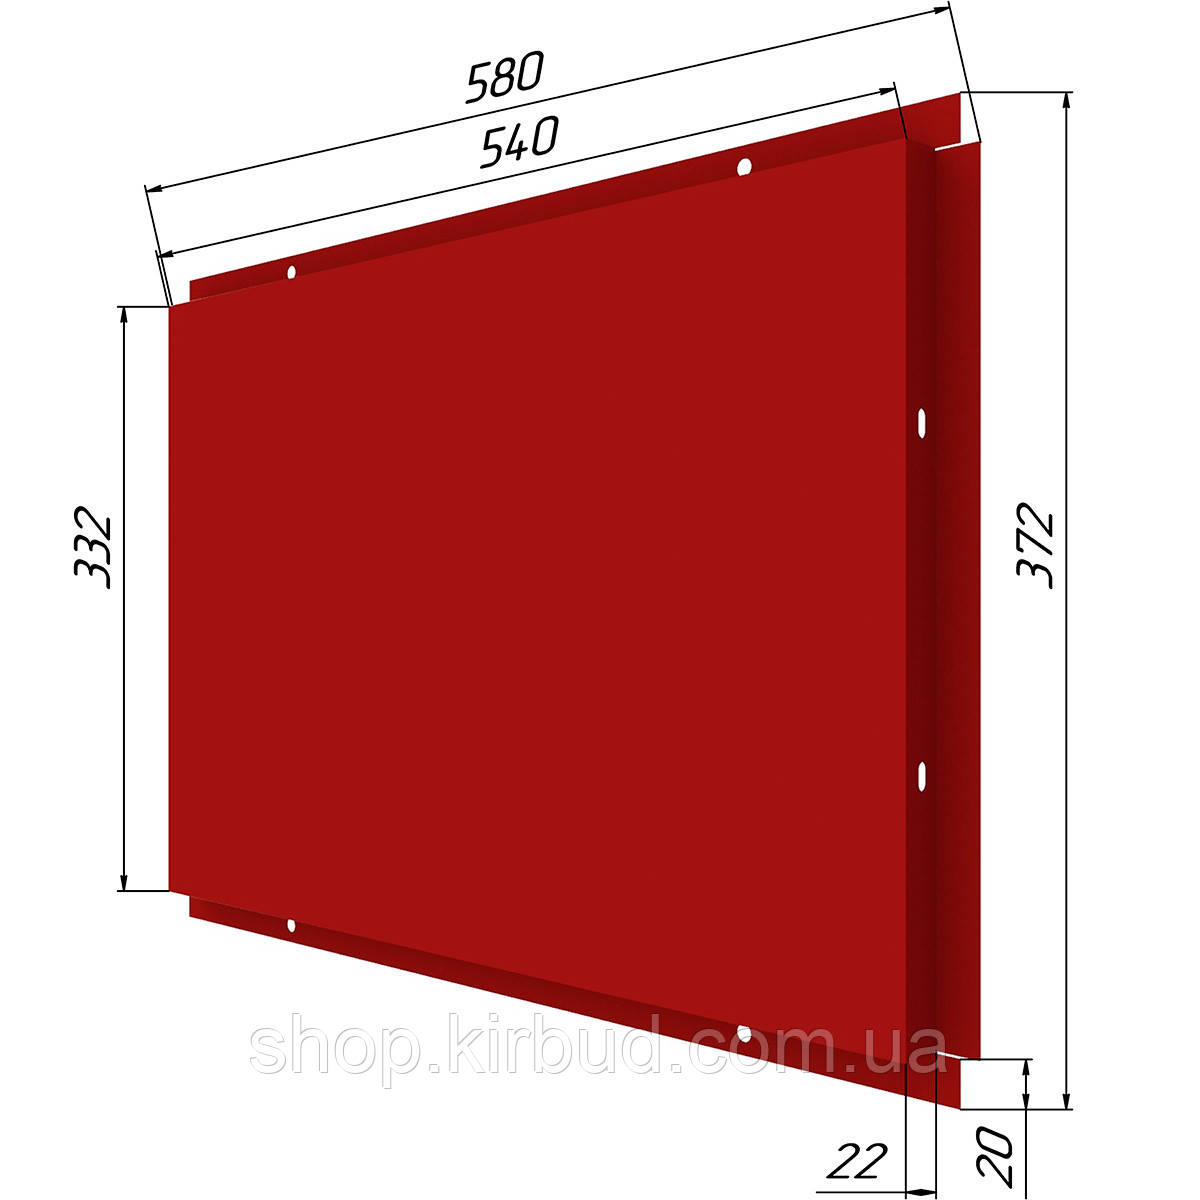 Фасадные касети (под заказ) оцинкованые 0,50мм 372х580мм